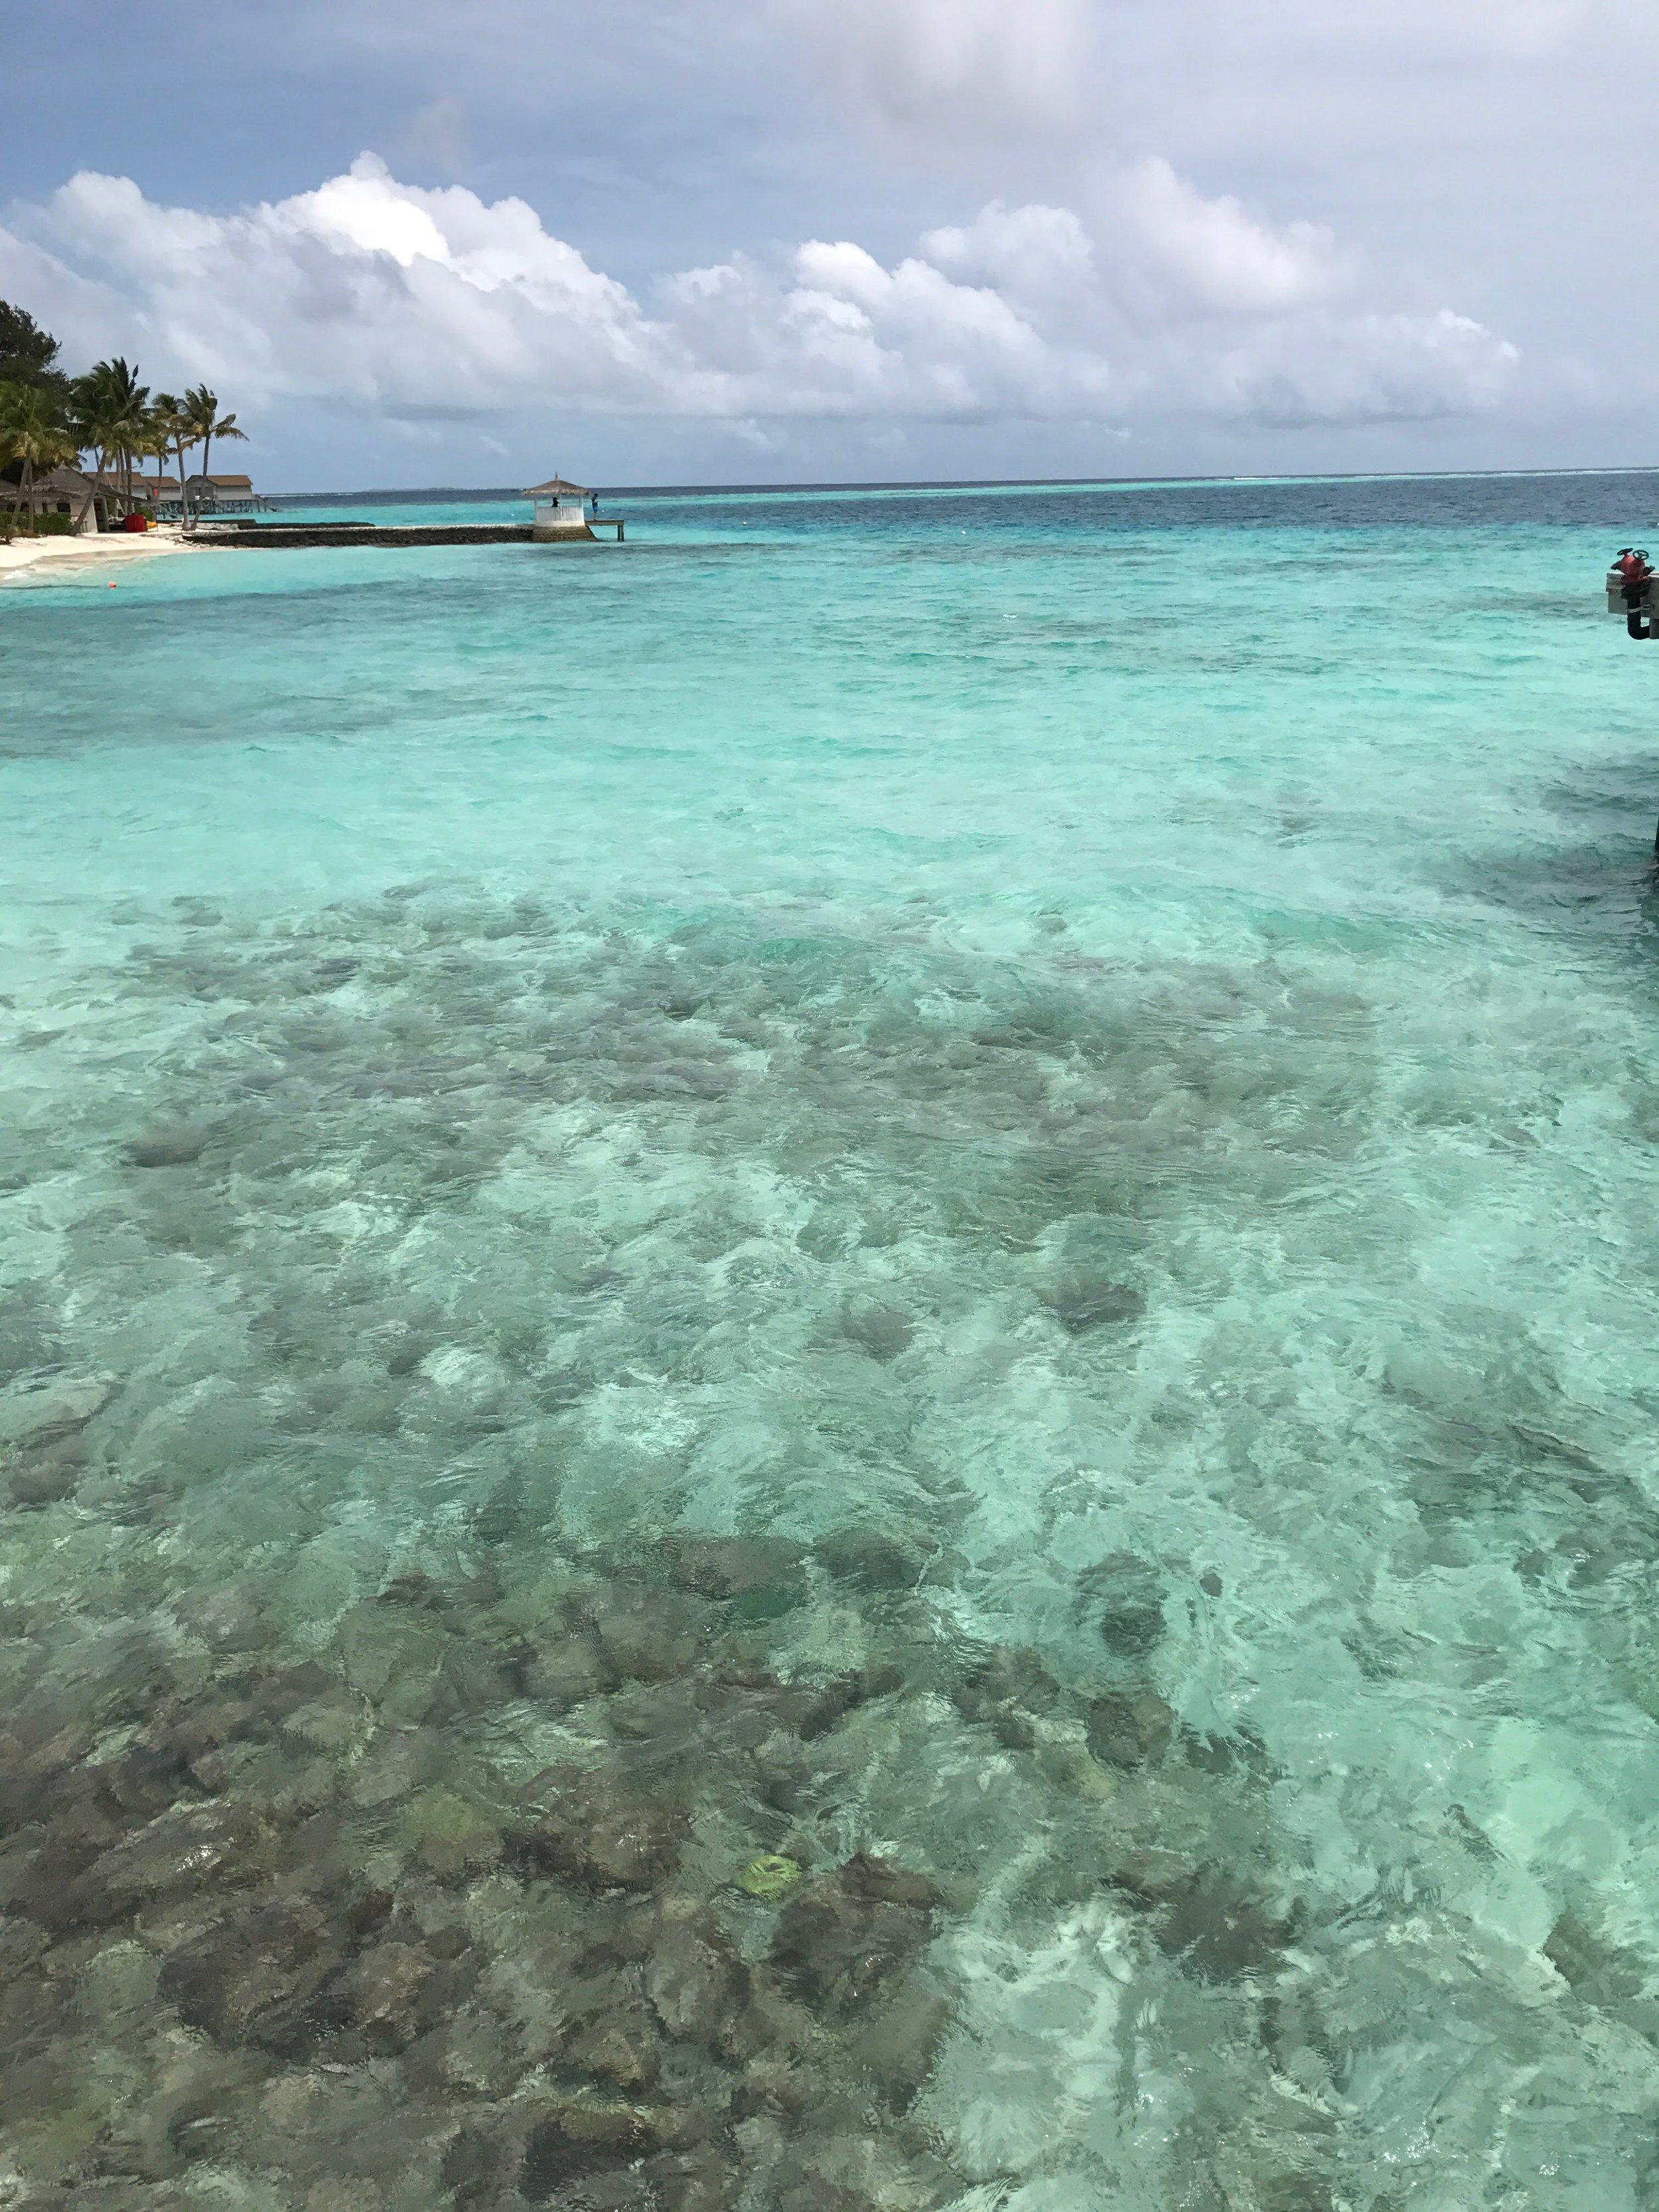 invite-to-paradise-maldives-sri-lanka-specialists-experts-travel-agent-tour-operator-customer-feedback-lucas-emily-fenning-elephant-orphanage-centara-ras-fushi-ocean.jpg